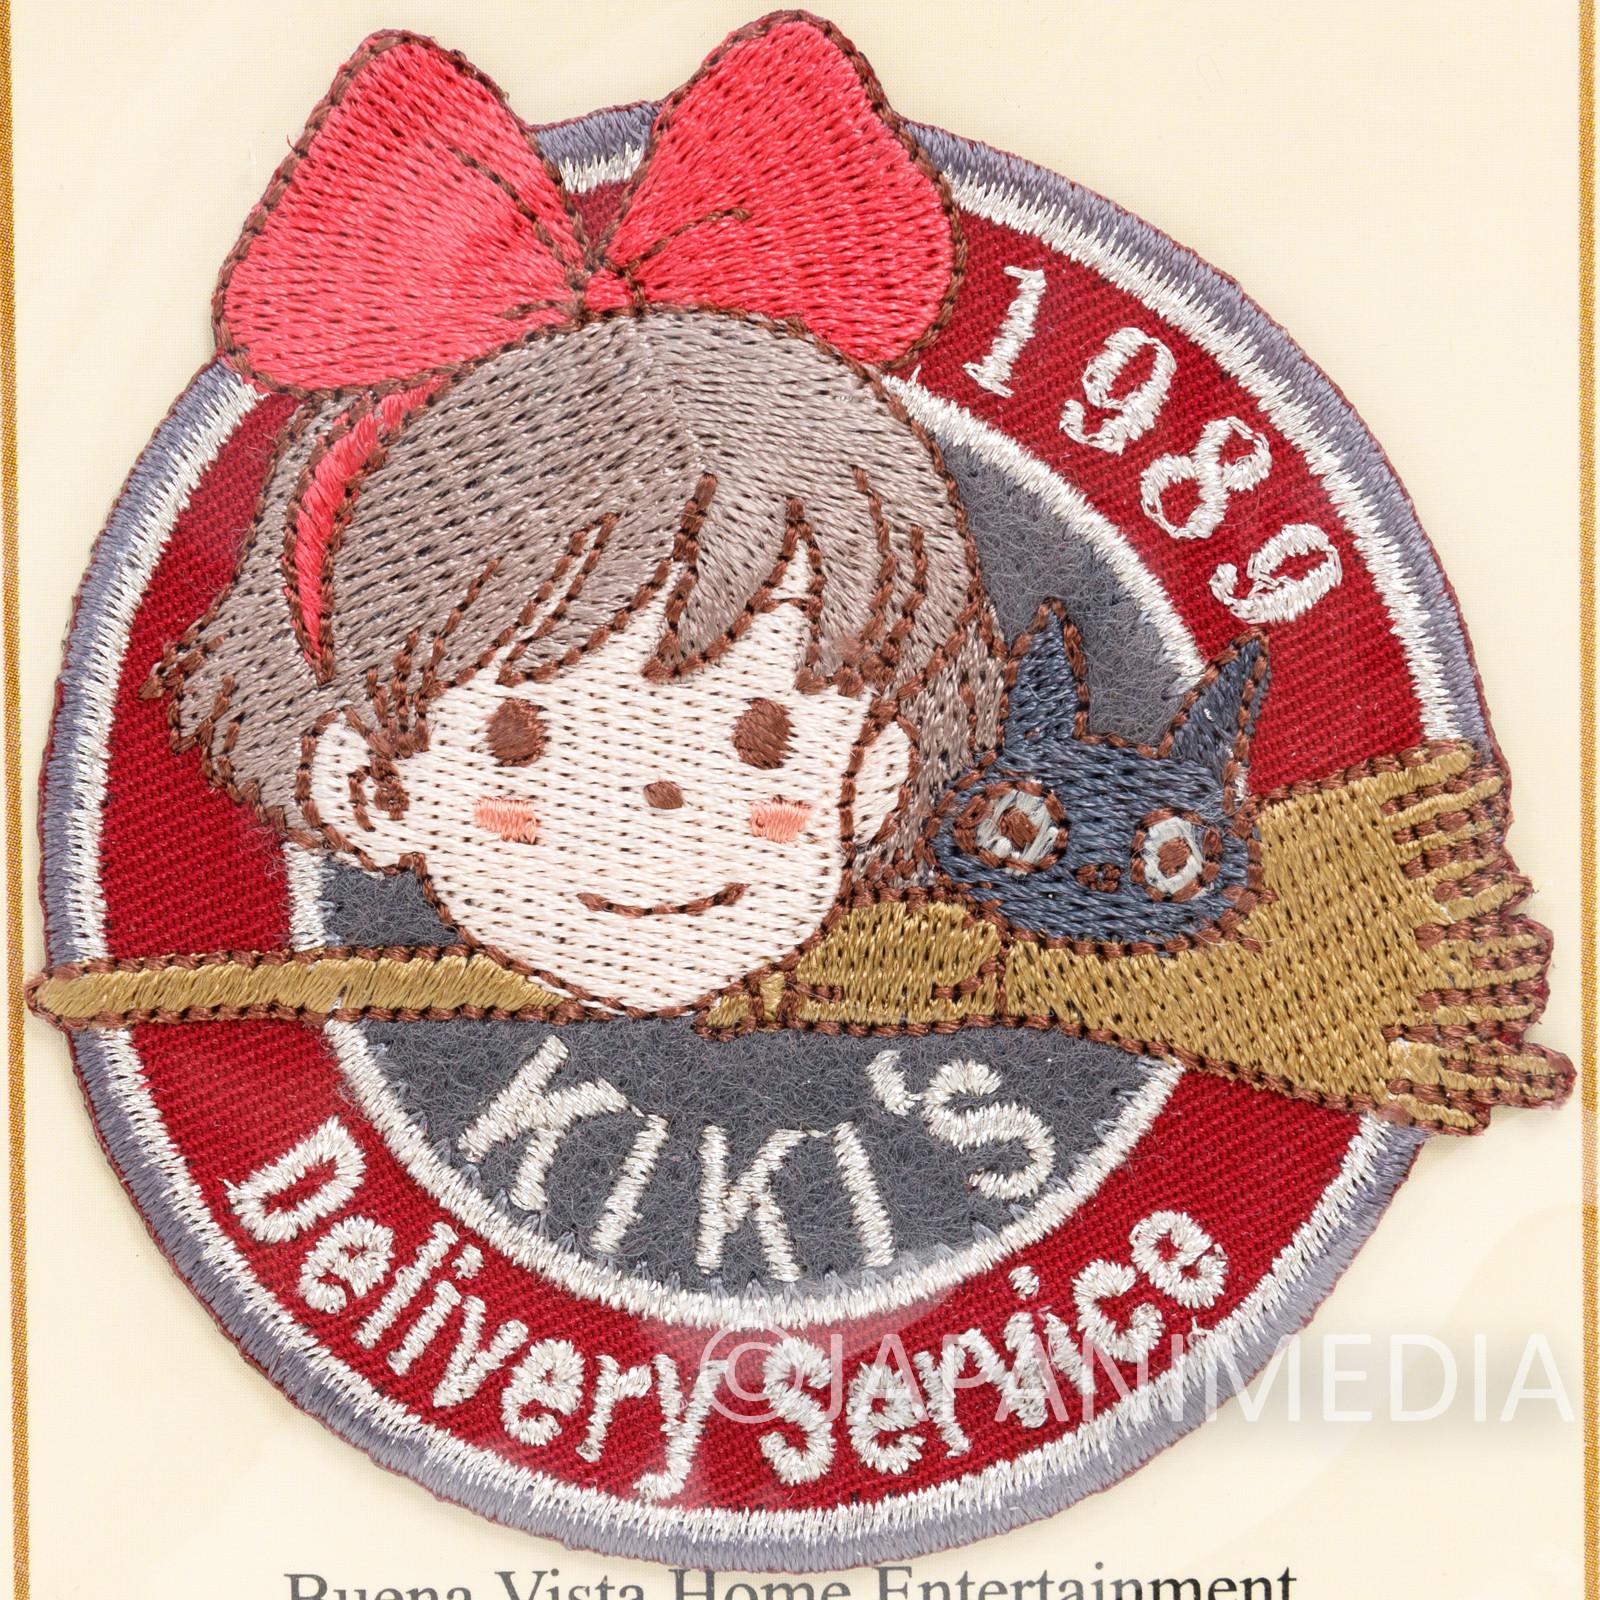 Kiki's Delivery Service Emblem Badge Wappen Ghibli JAPAN ANIME